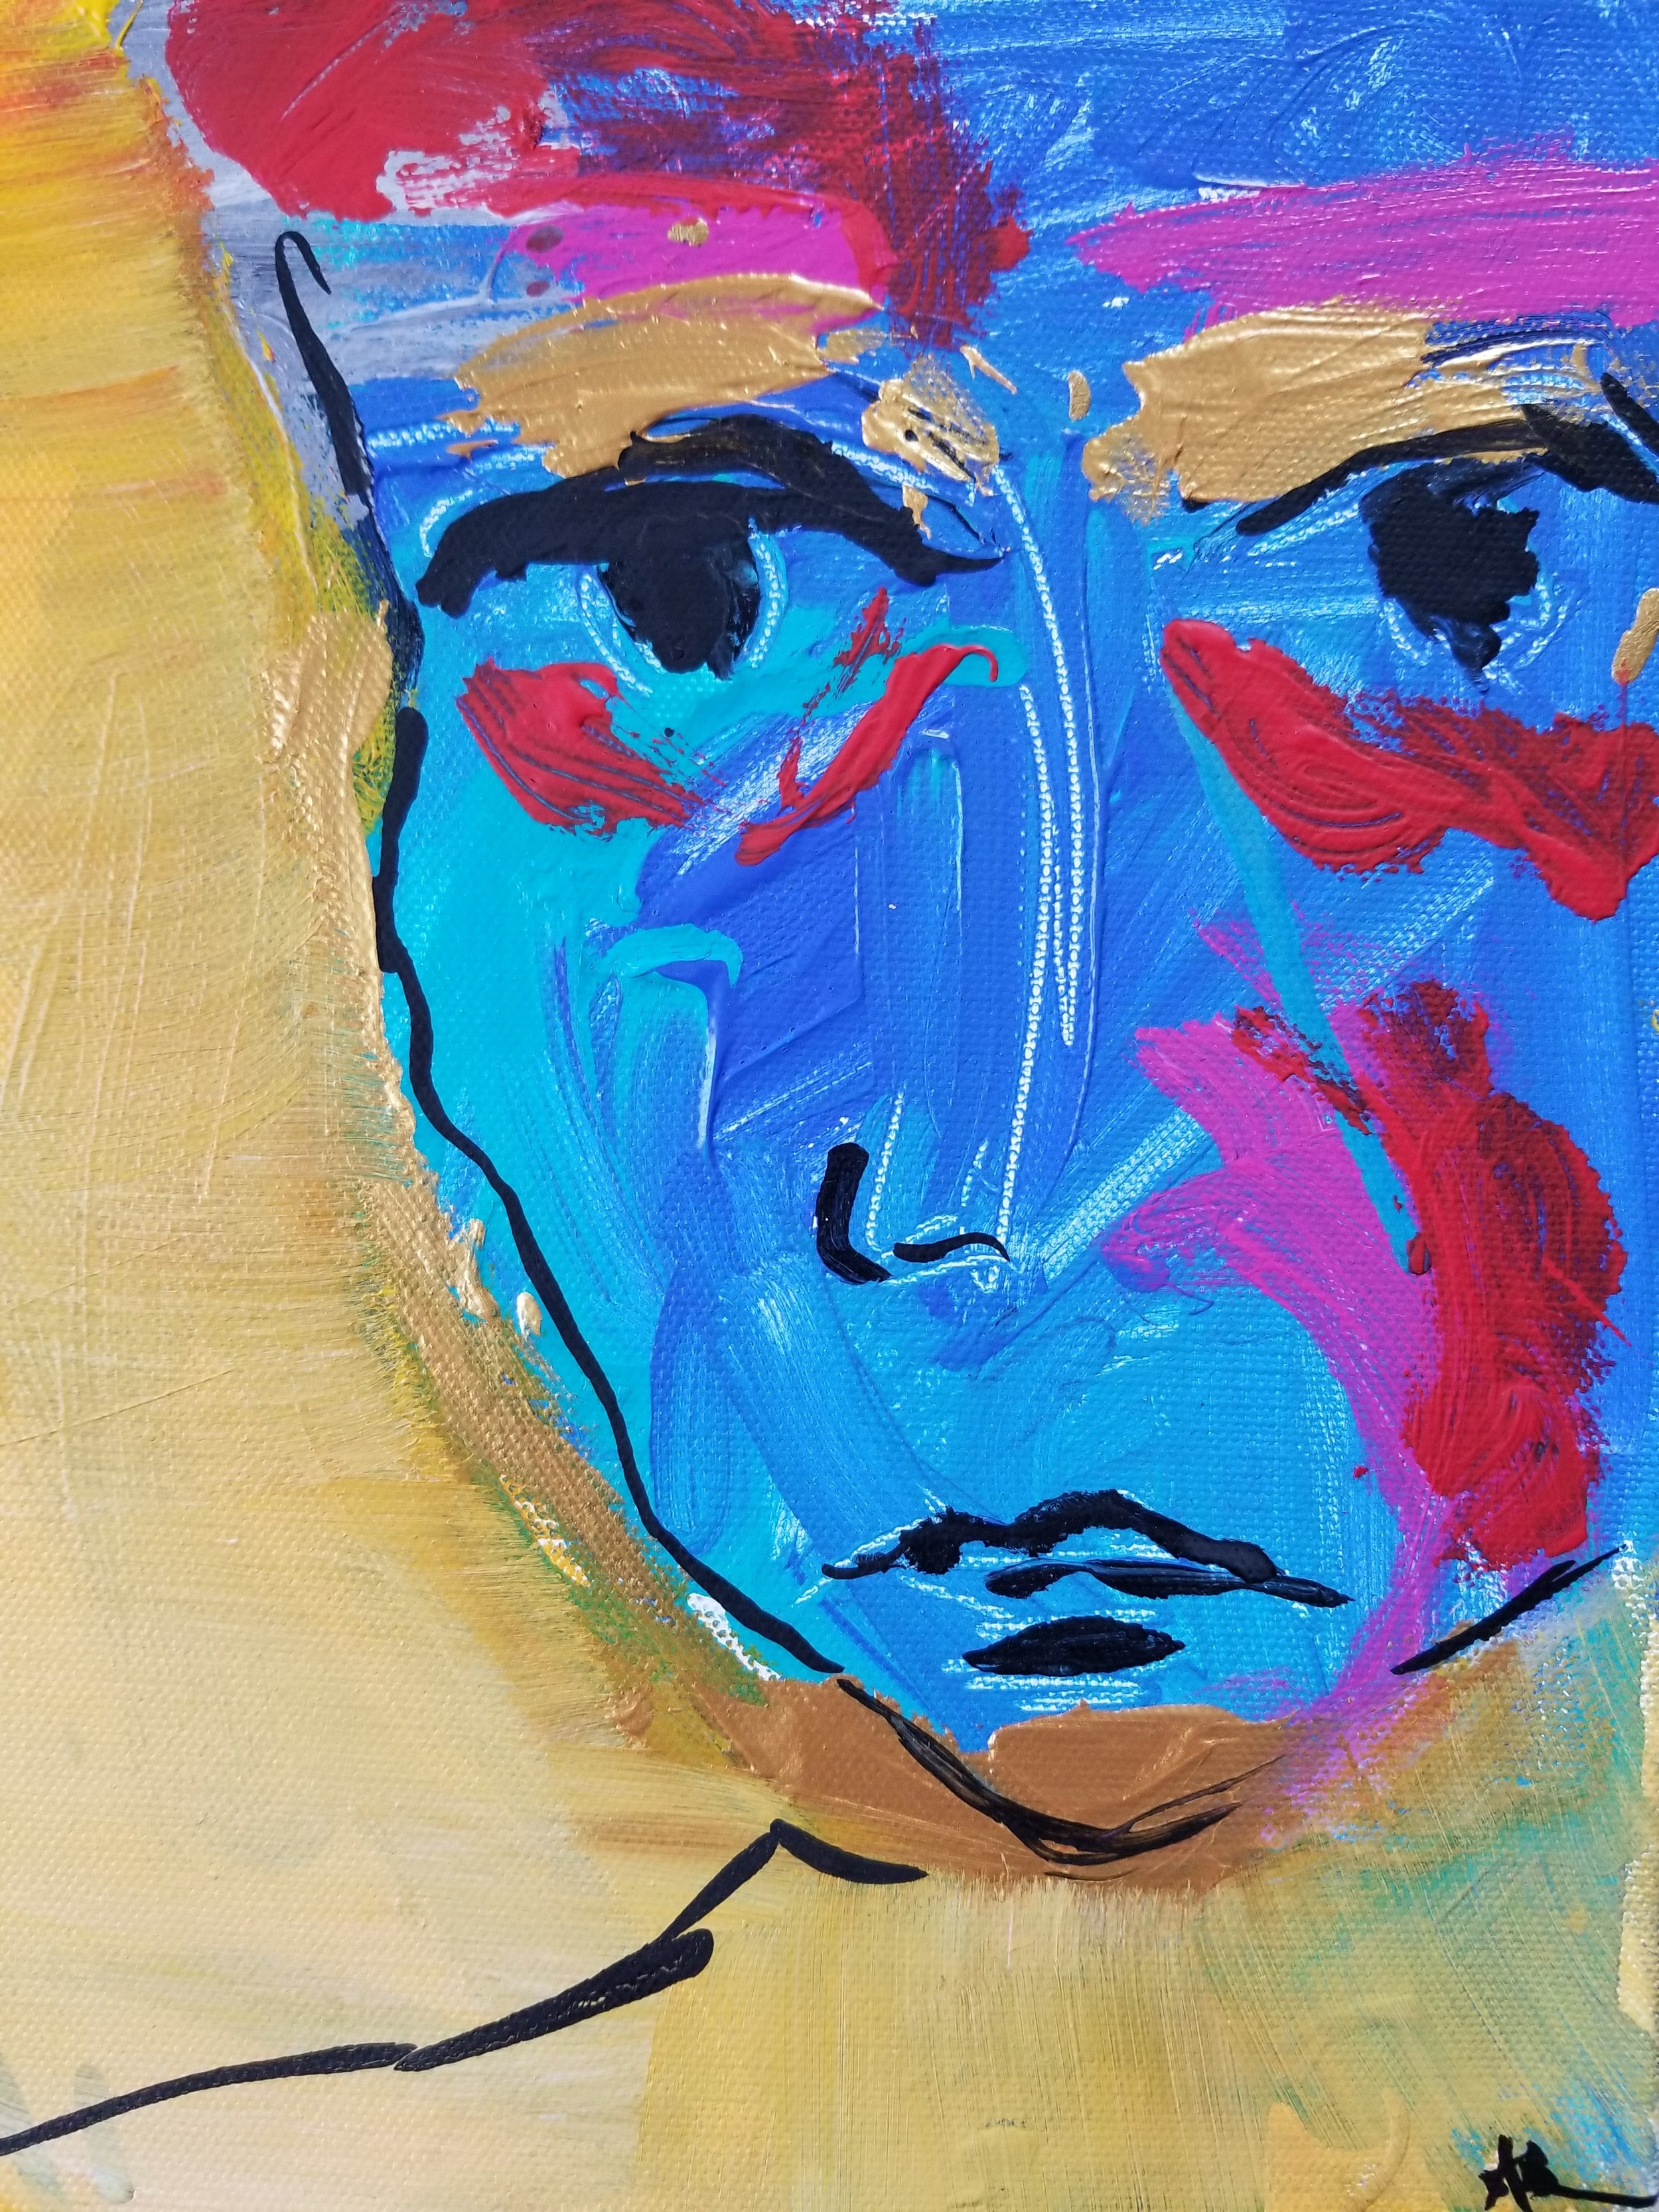 A.R.DREWART BareBlue AcrylicOilStcikCanvas 10x8 2018 Price250.jpg